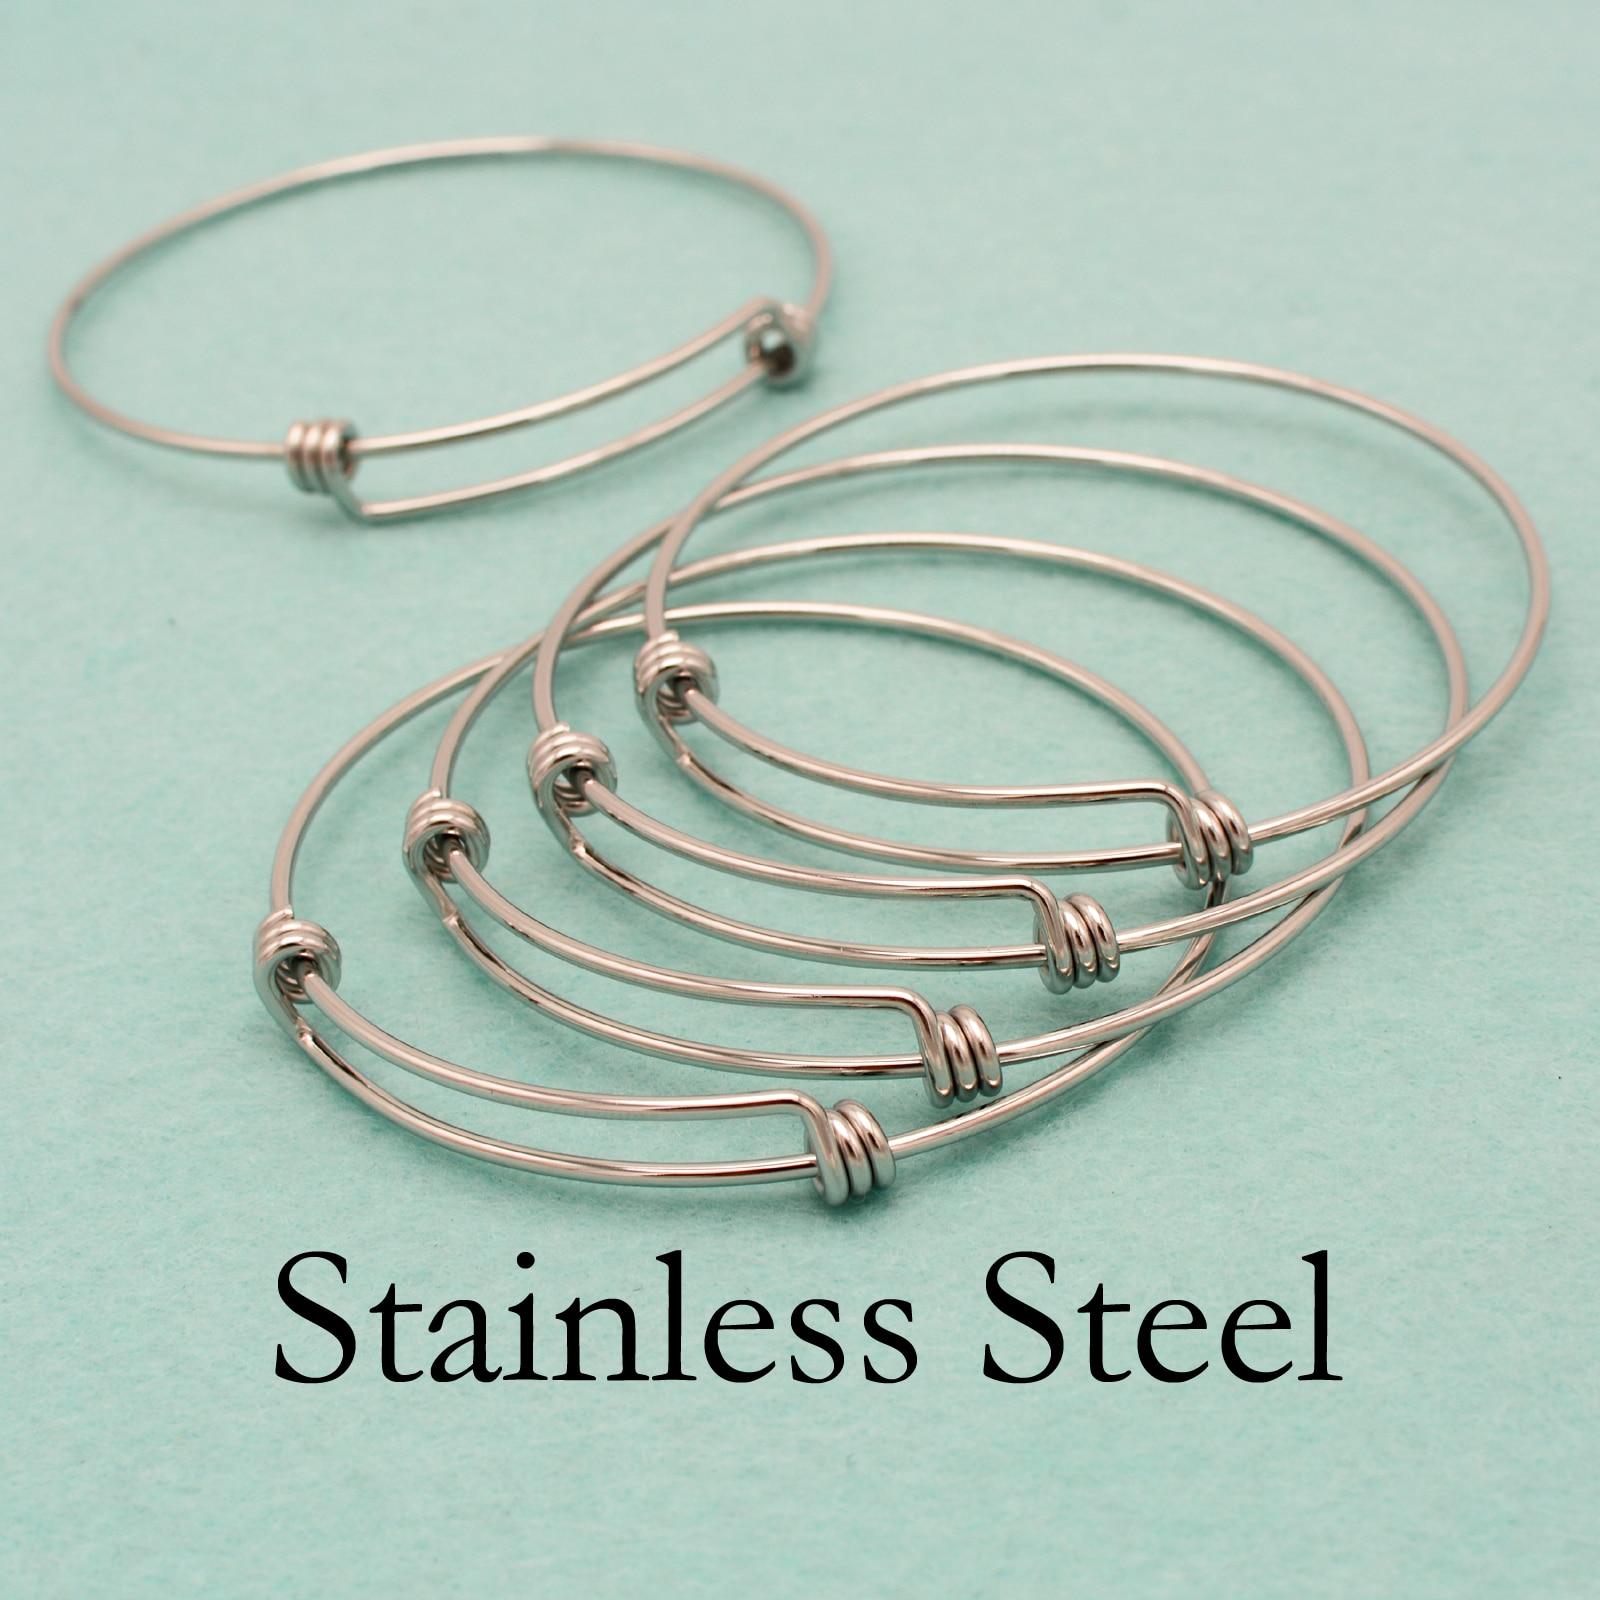 50 pcs Stainless Steel Bracelet Bangle Adjustable Bracelet Blank Charm Bangle Charm Bracelet Stainless Steel Charm